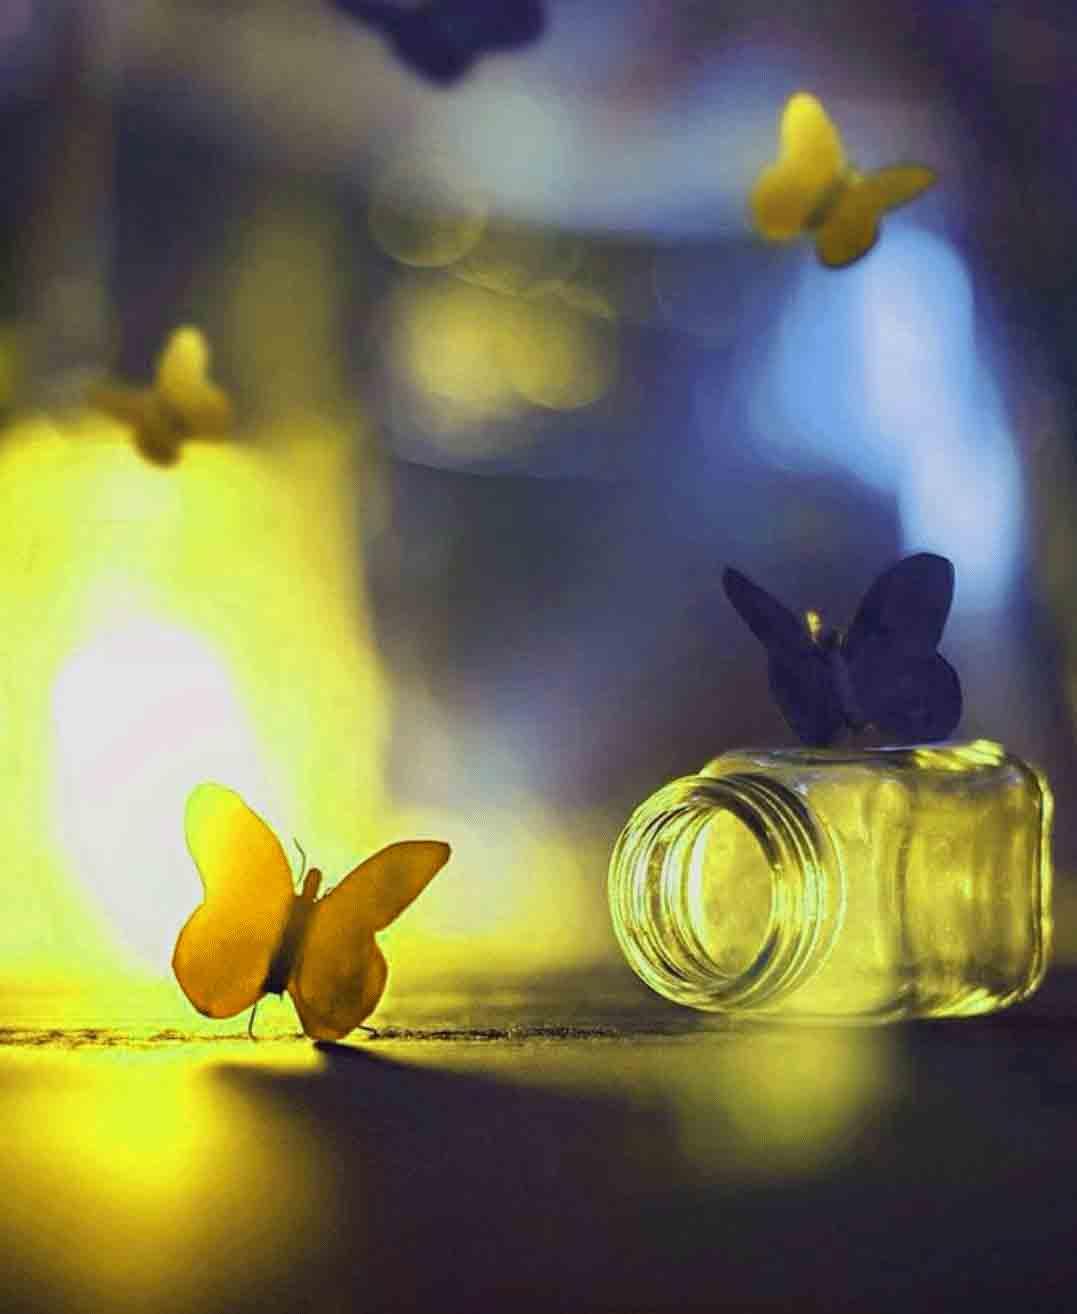 free hd Beautiful Whatsapp Dp Images